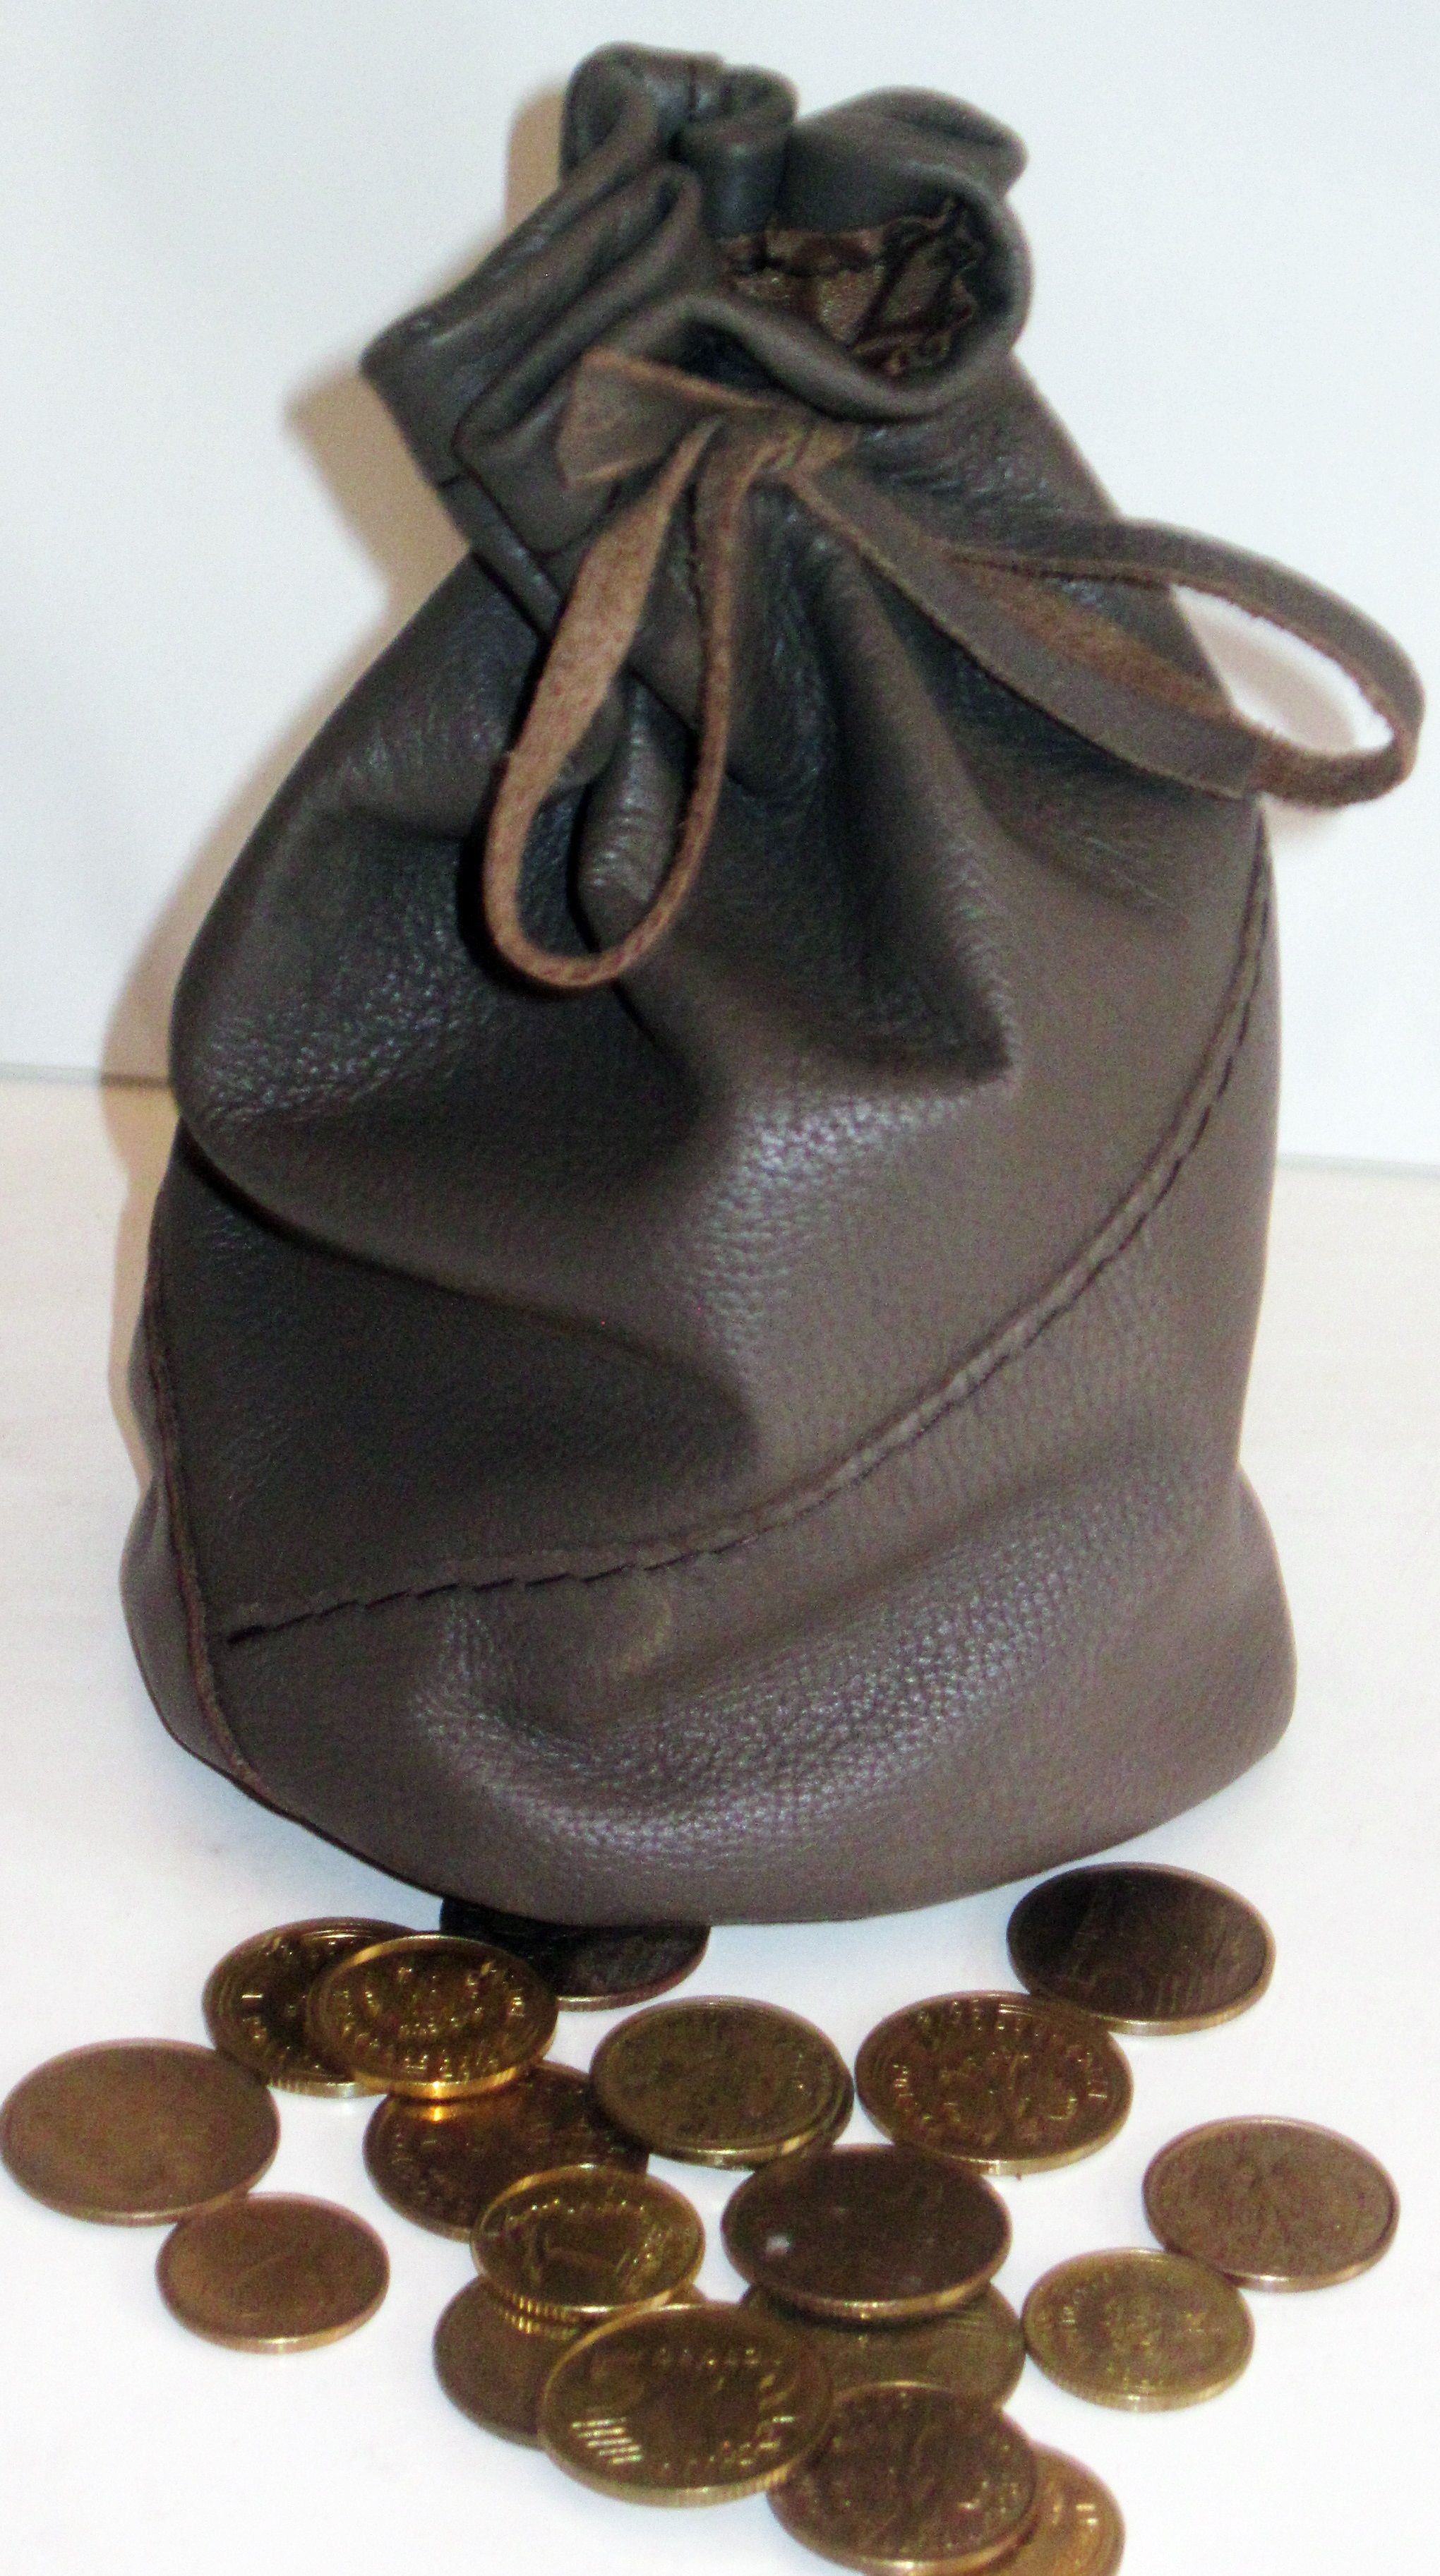 Sakiewka Mieszek Portfel Na Monety Skora Naturalna 8336960134 Oficjalne Archiwum Allegro Bucket Bag Bags Items